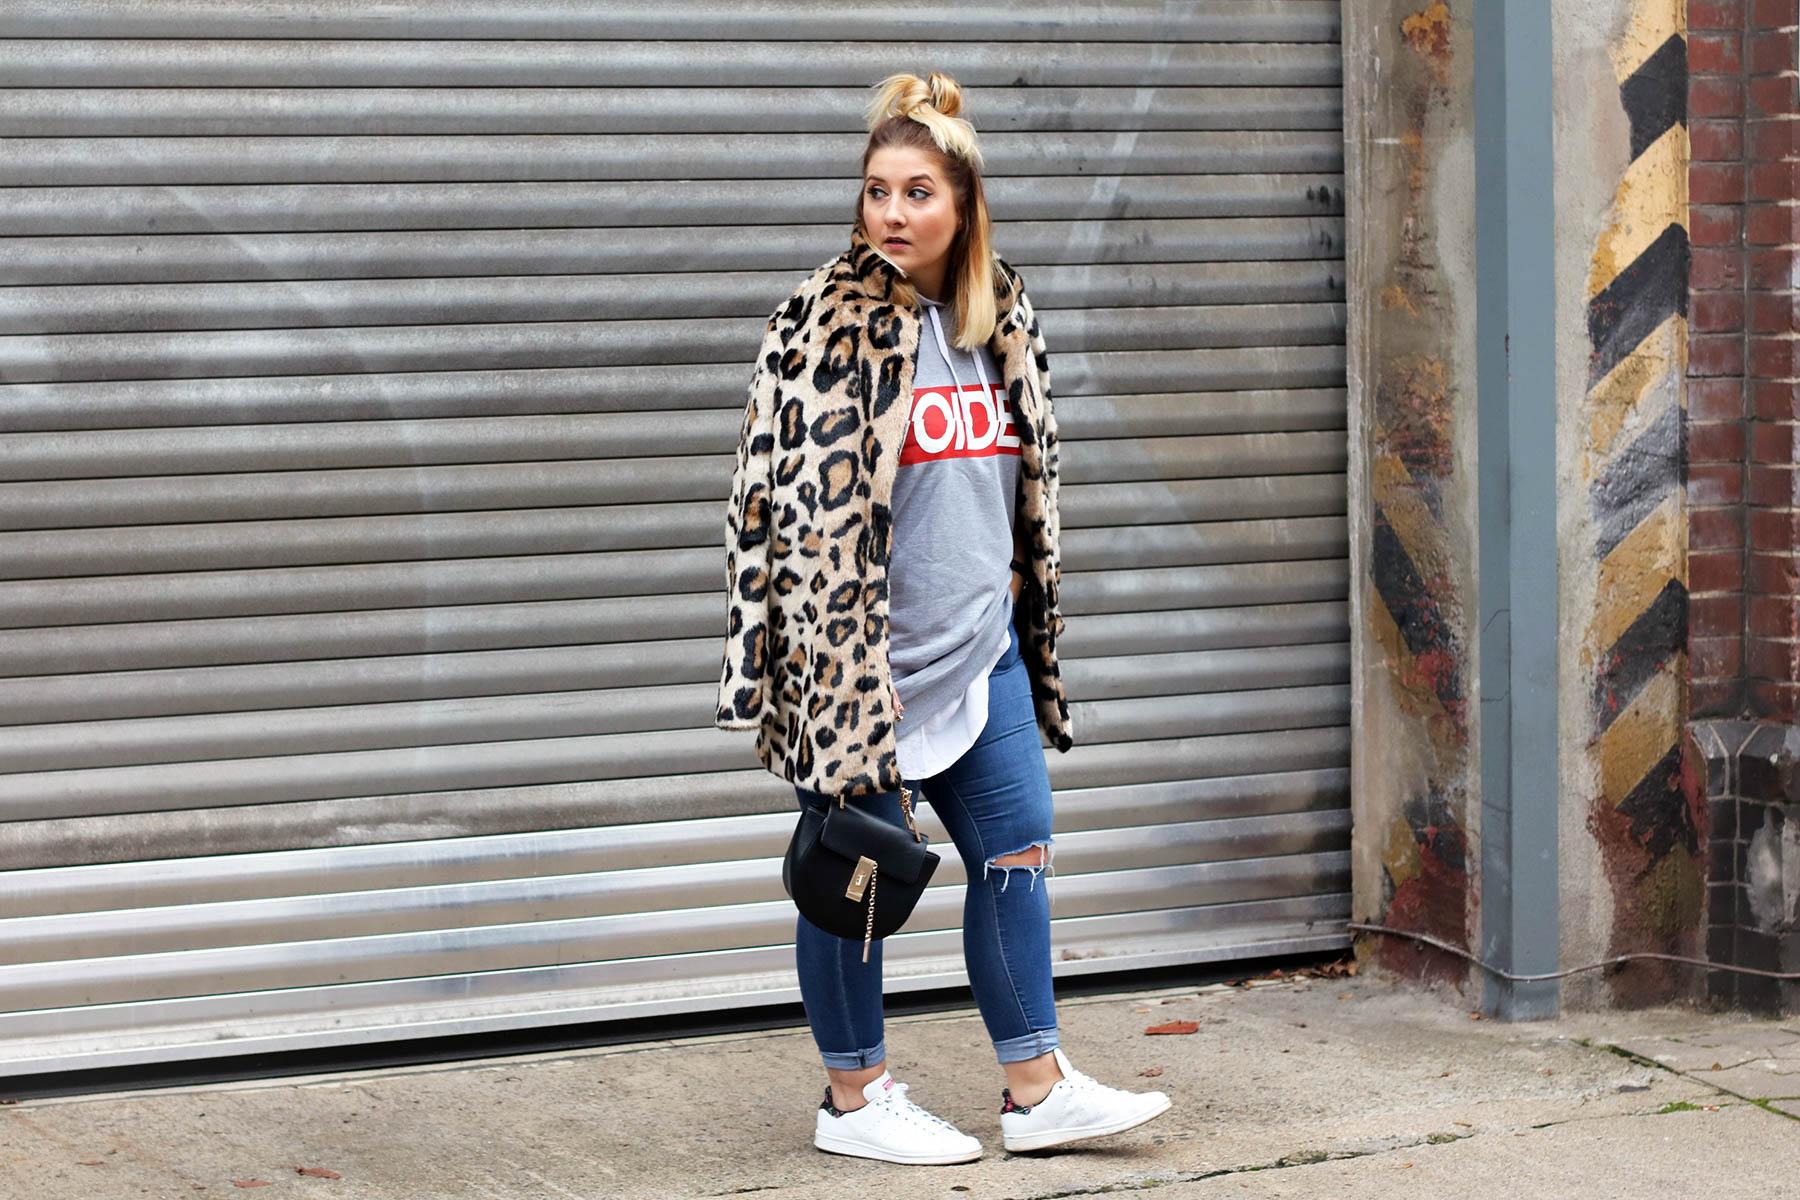 outfit-modeblog-fashionblog-fashionpassionlove-leo-mantel-trend-mantel-winter-sneaker-adidas18 (1 von 1)